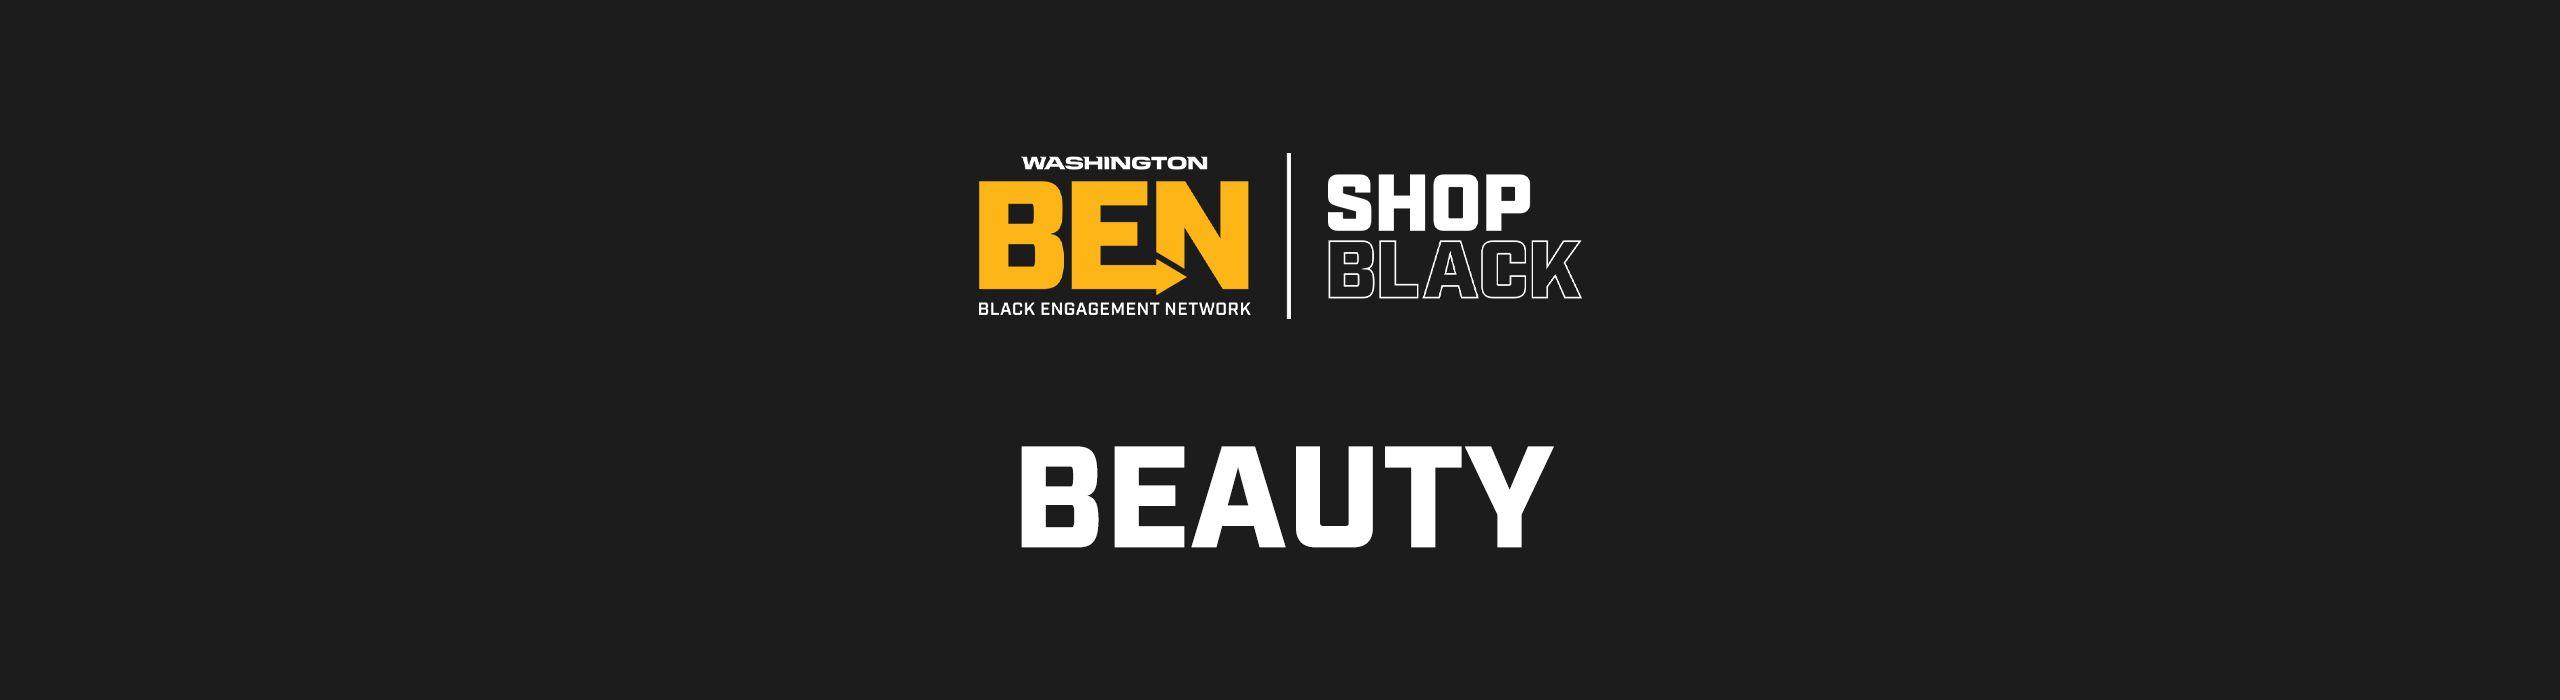 2020BEN_ShopBlack_CategoryPageHeader_Beauty